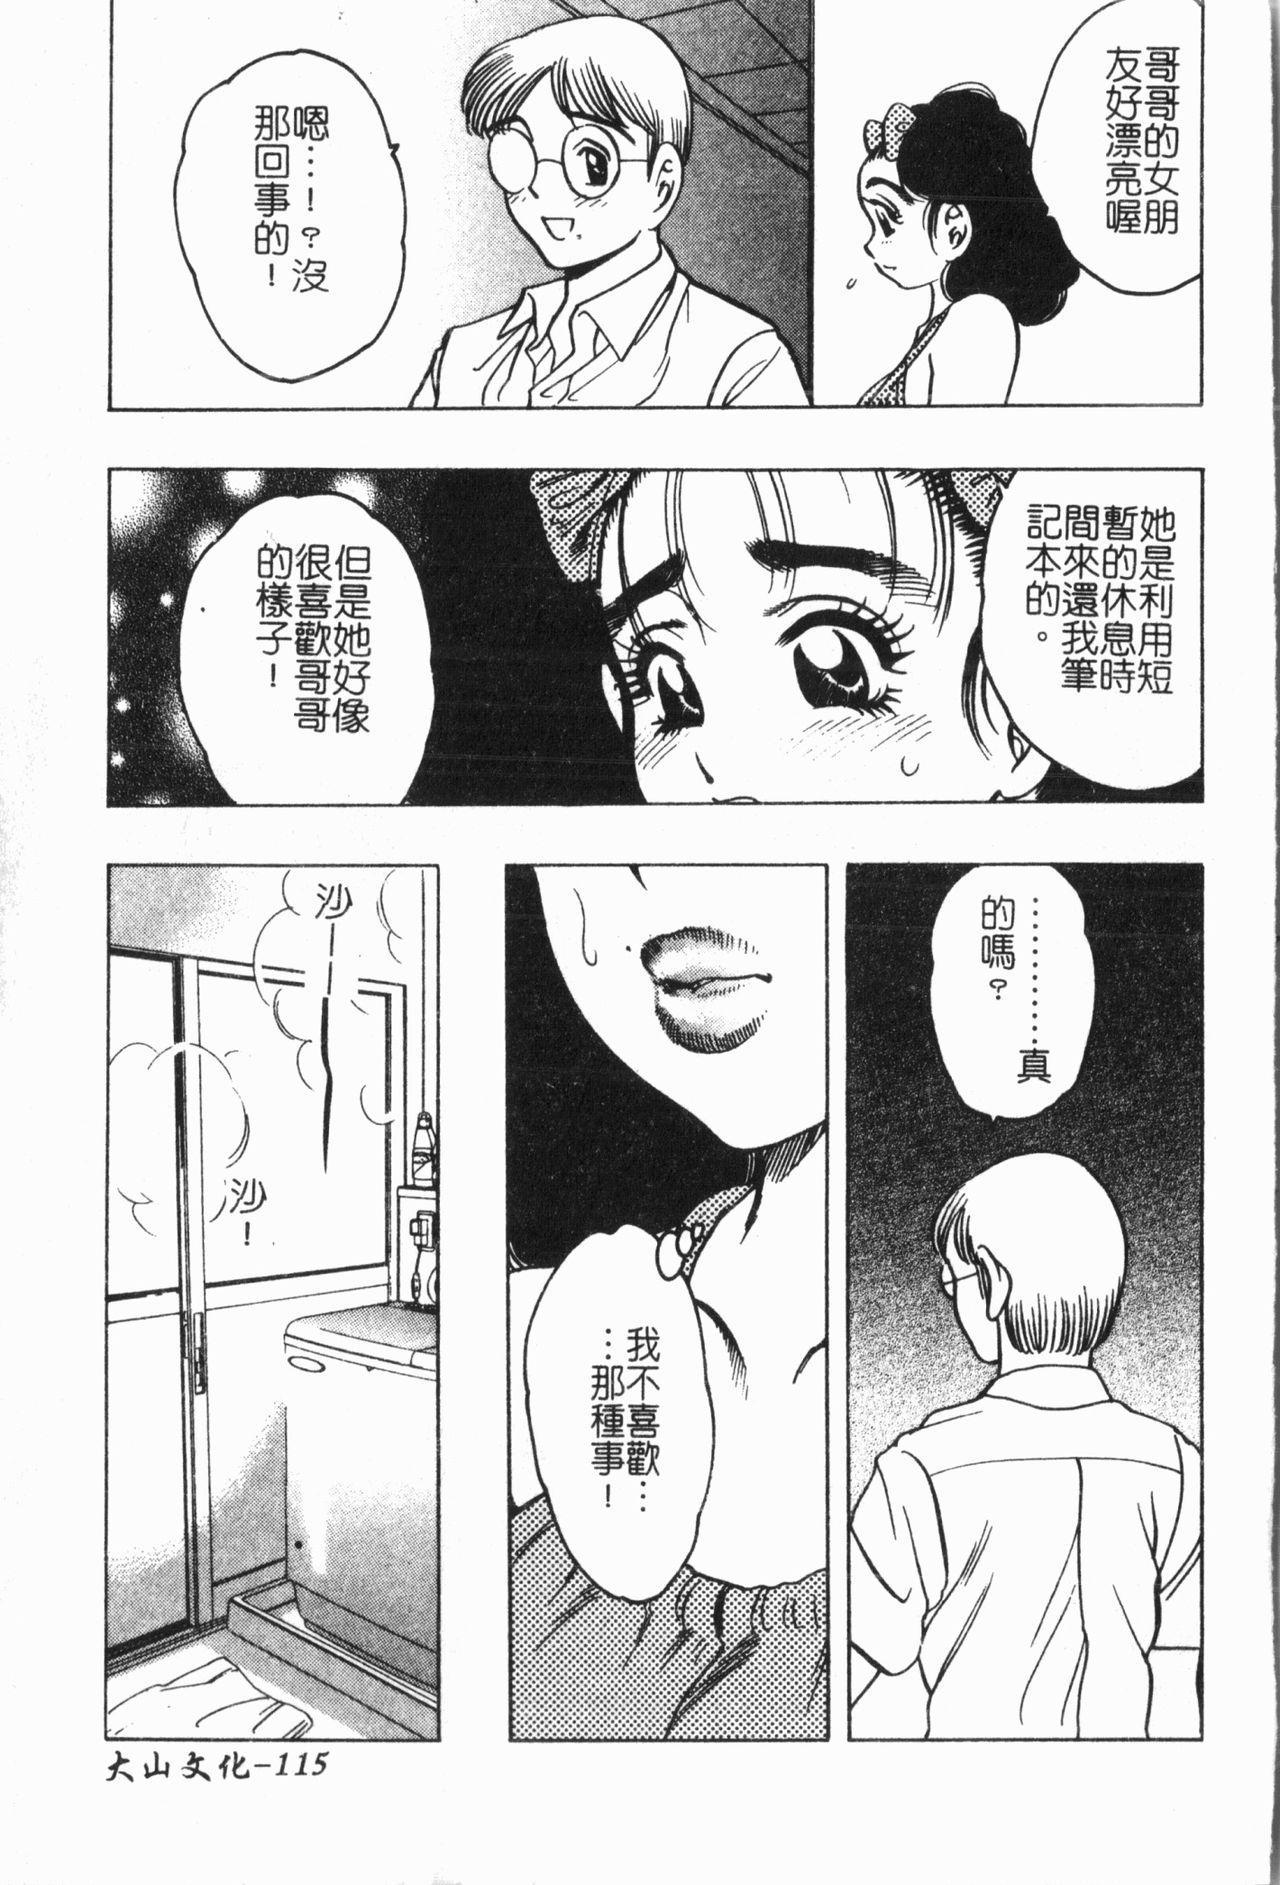 Imouto Koishi 6 117